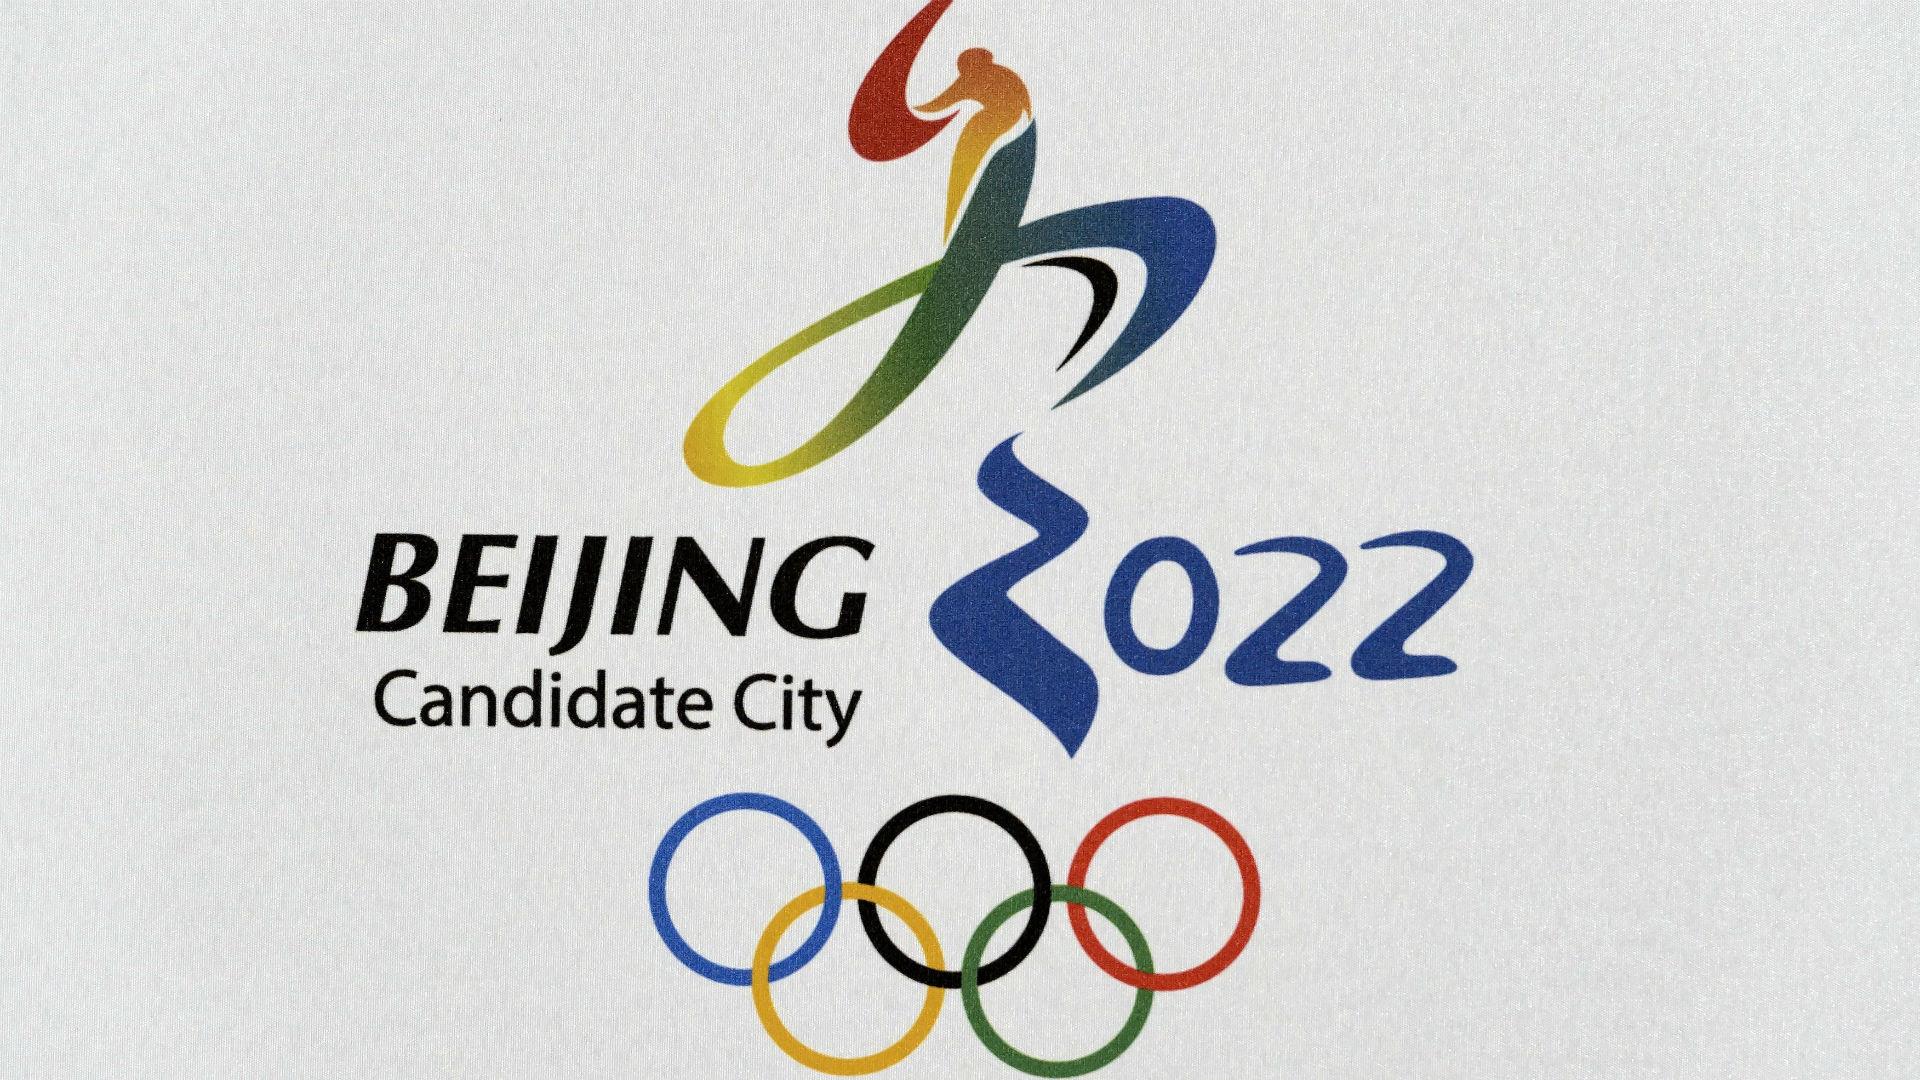 Beijing chosen as 2022 winter olympics host other sports beijing chosen as 2022 winter olympics host other sports sporting news biocorpaavc Choice Image